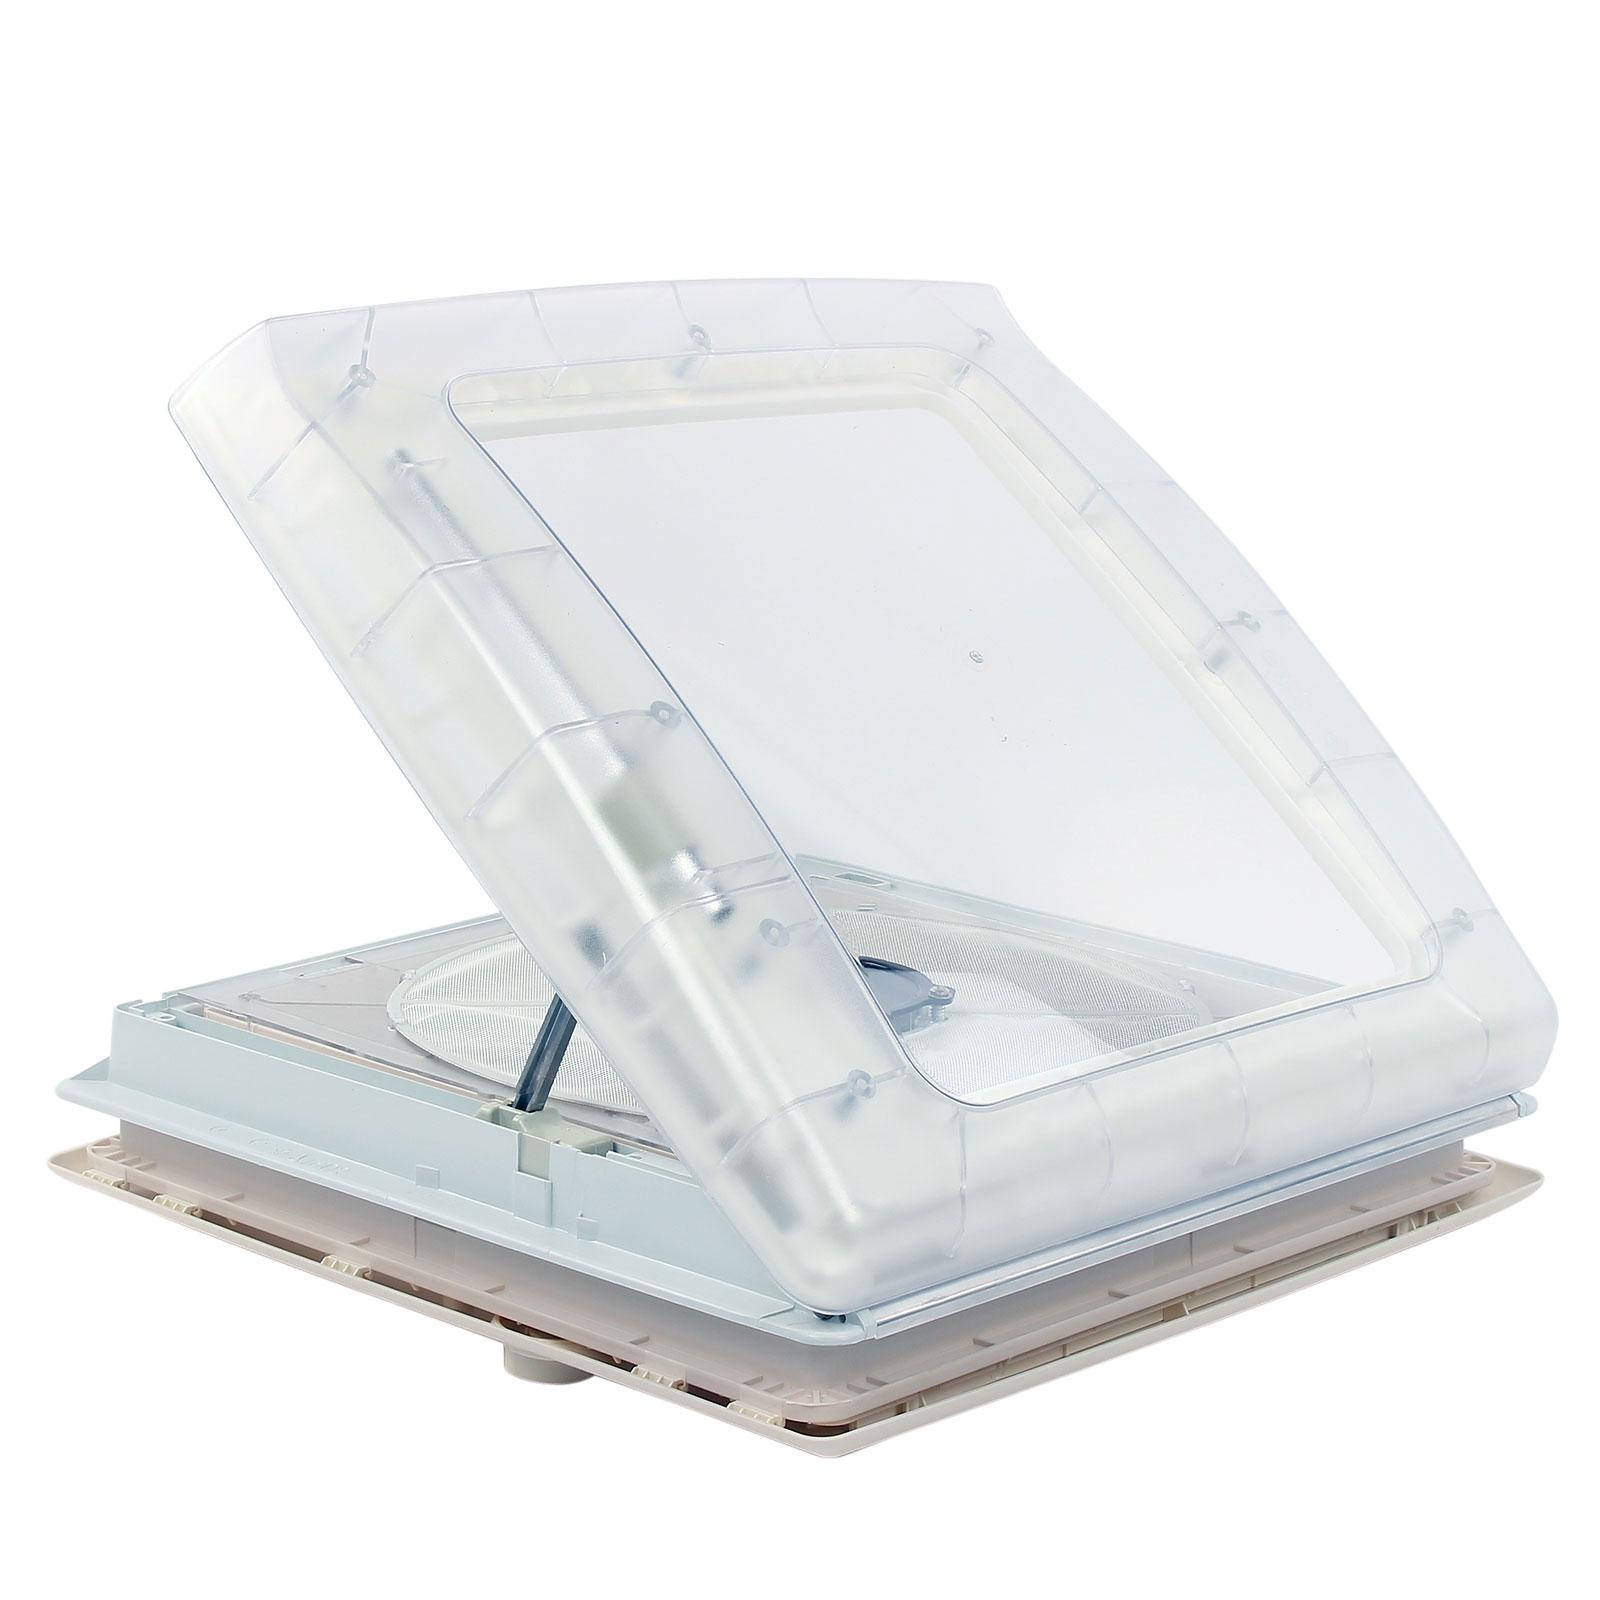 Thule  Kurbeldachhaube Omni-Vent transparent 40x40 12 Volt Ventilator